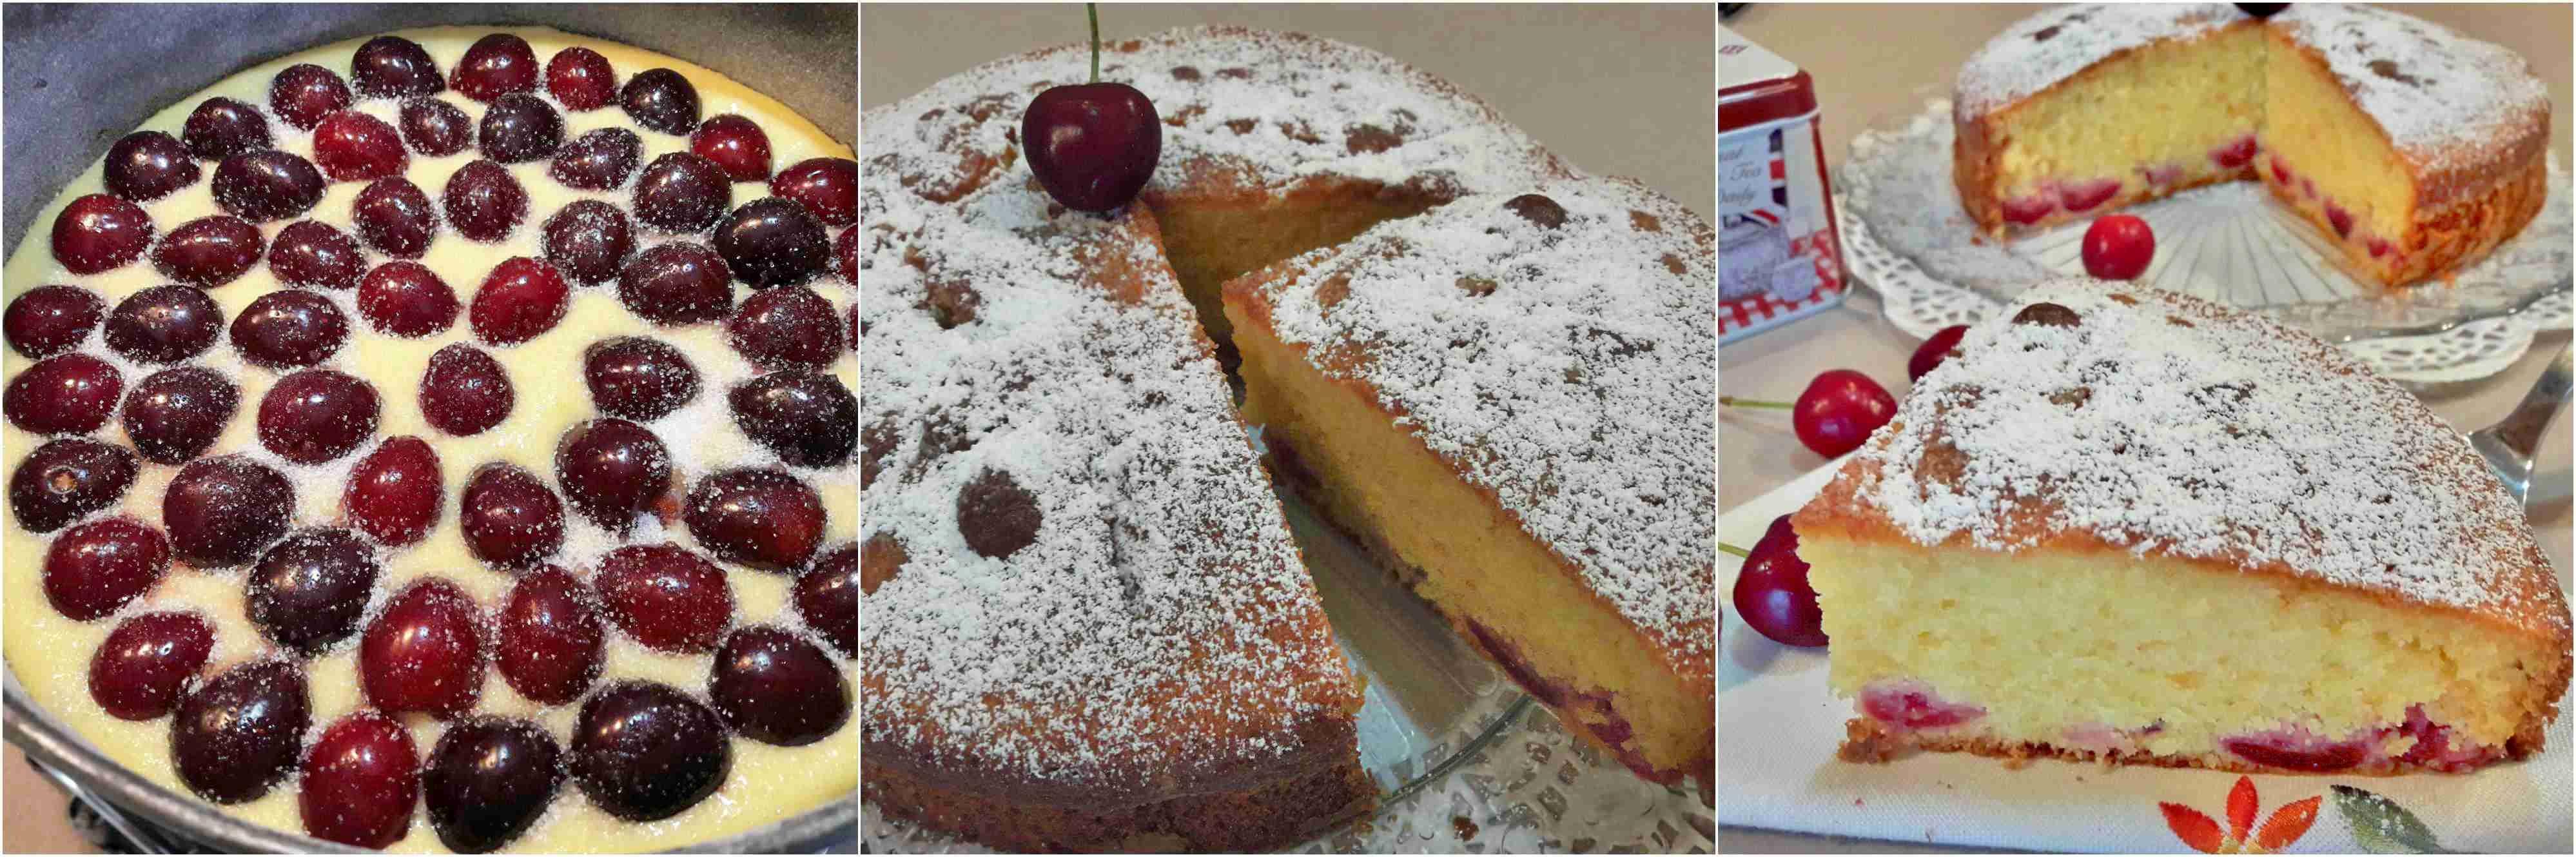 torta panna ciliegie box@VG-2